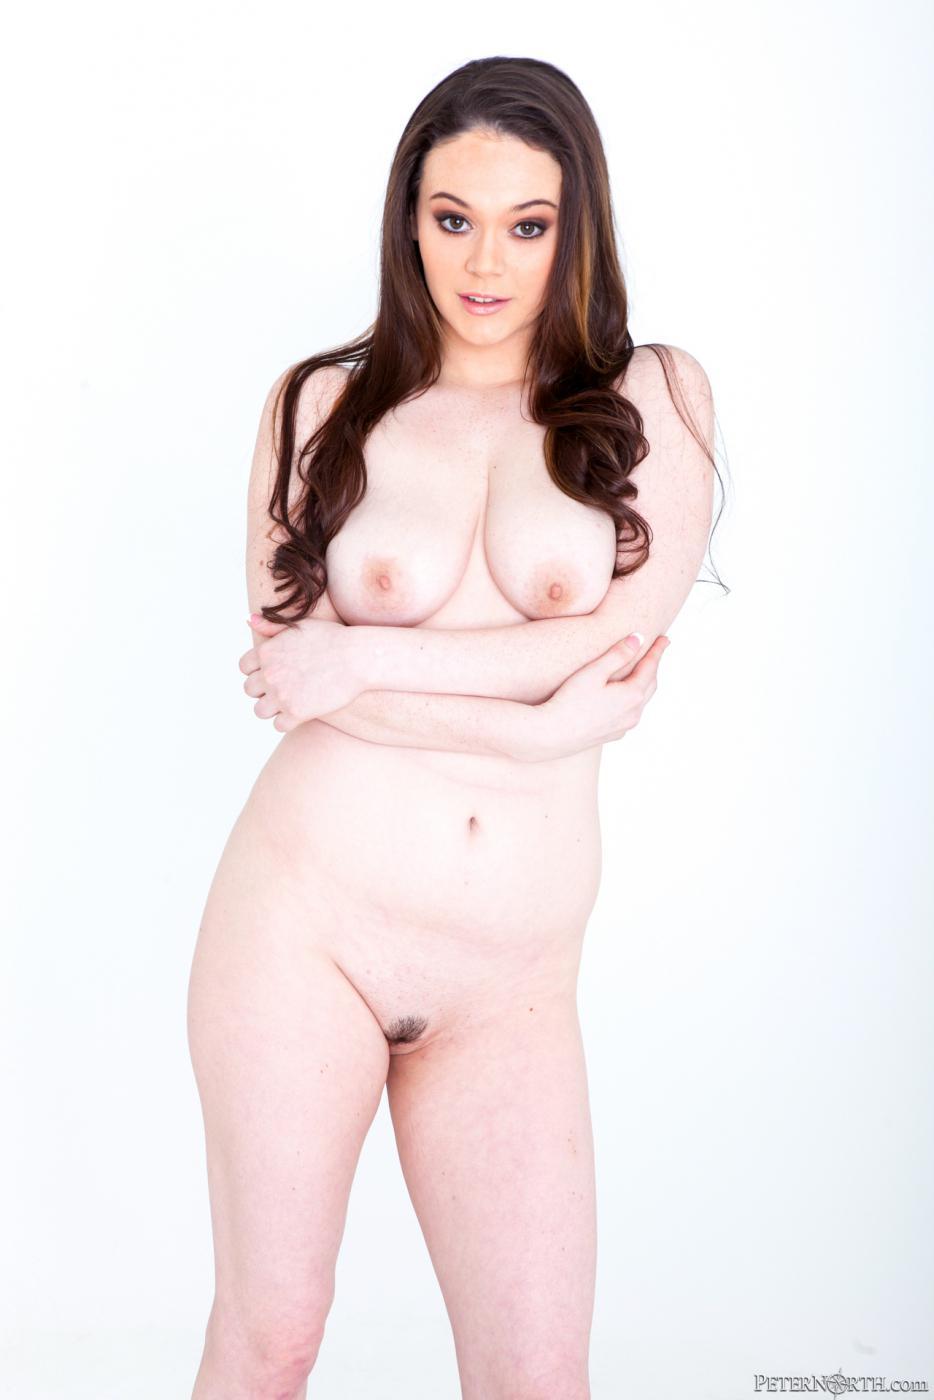 Mature ladies nipples